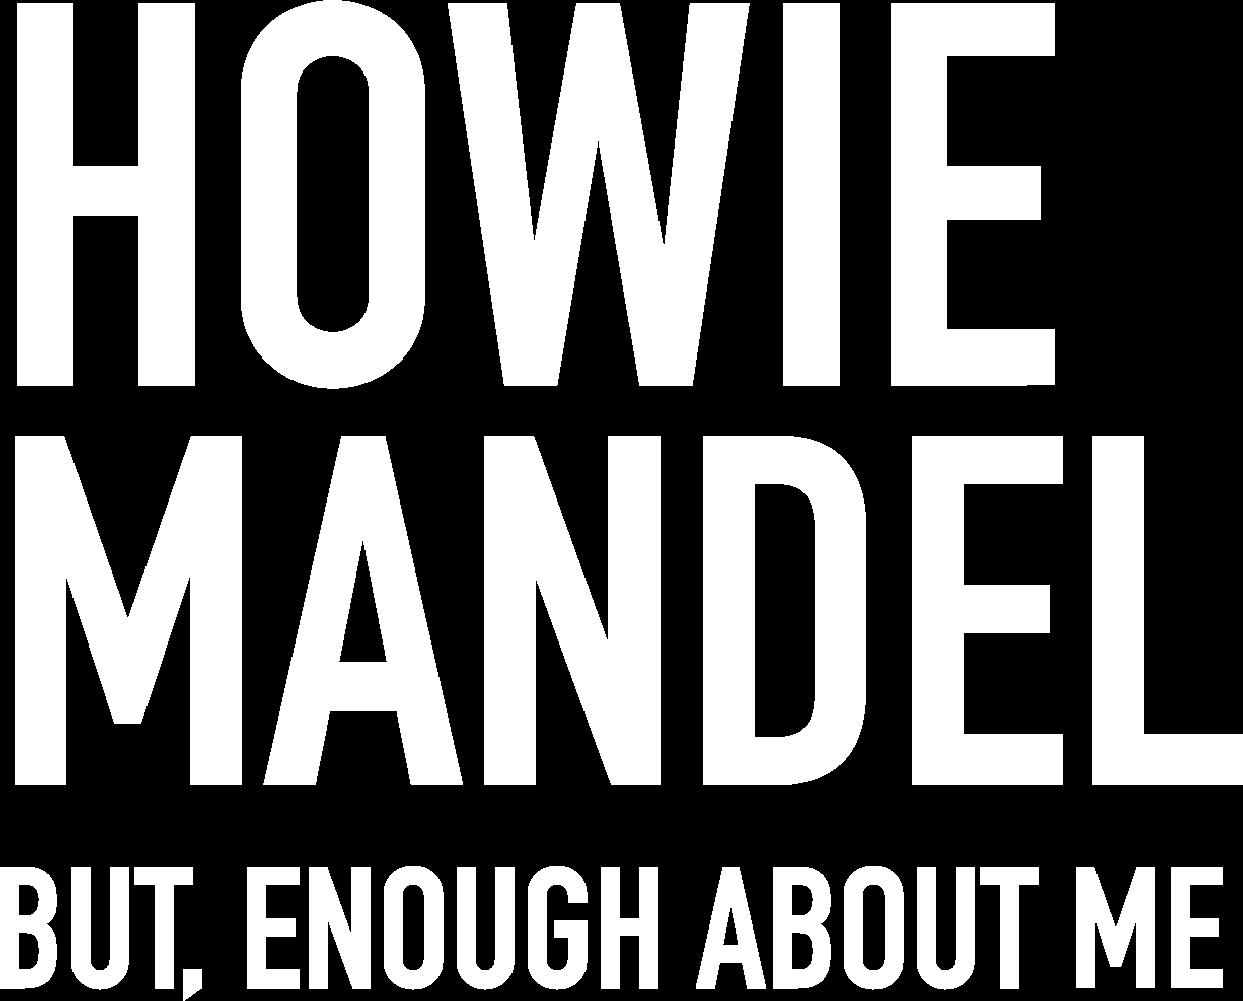 Howie Mandel: But, Enough About Me